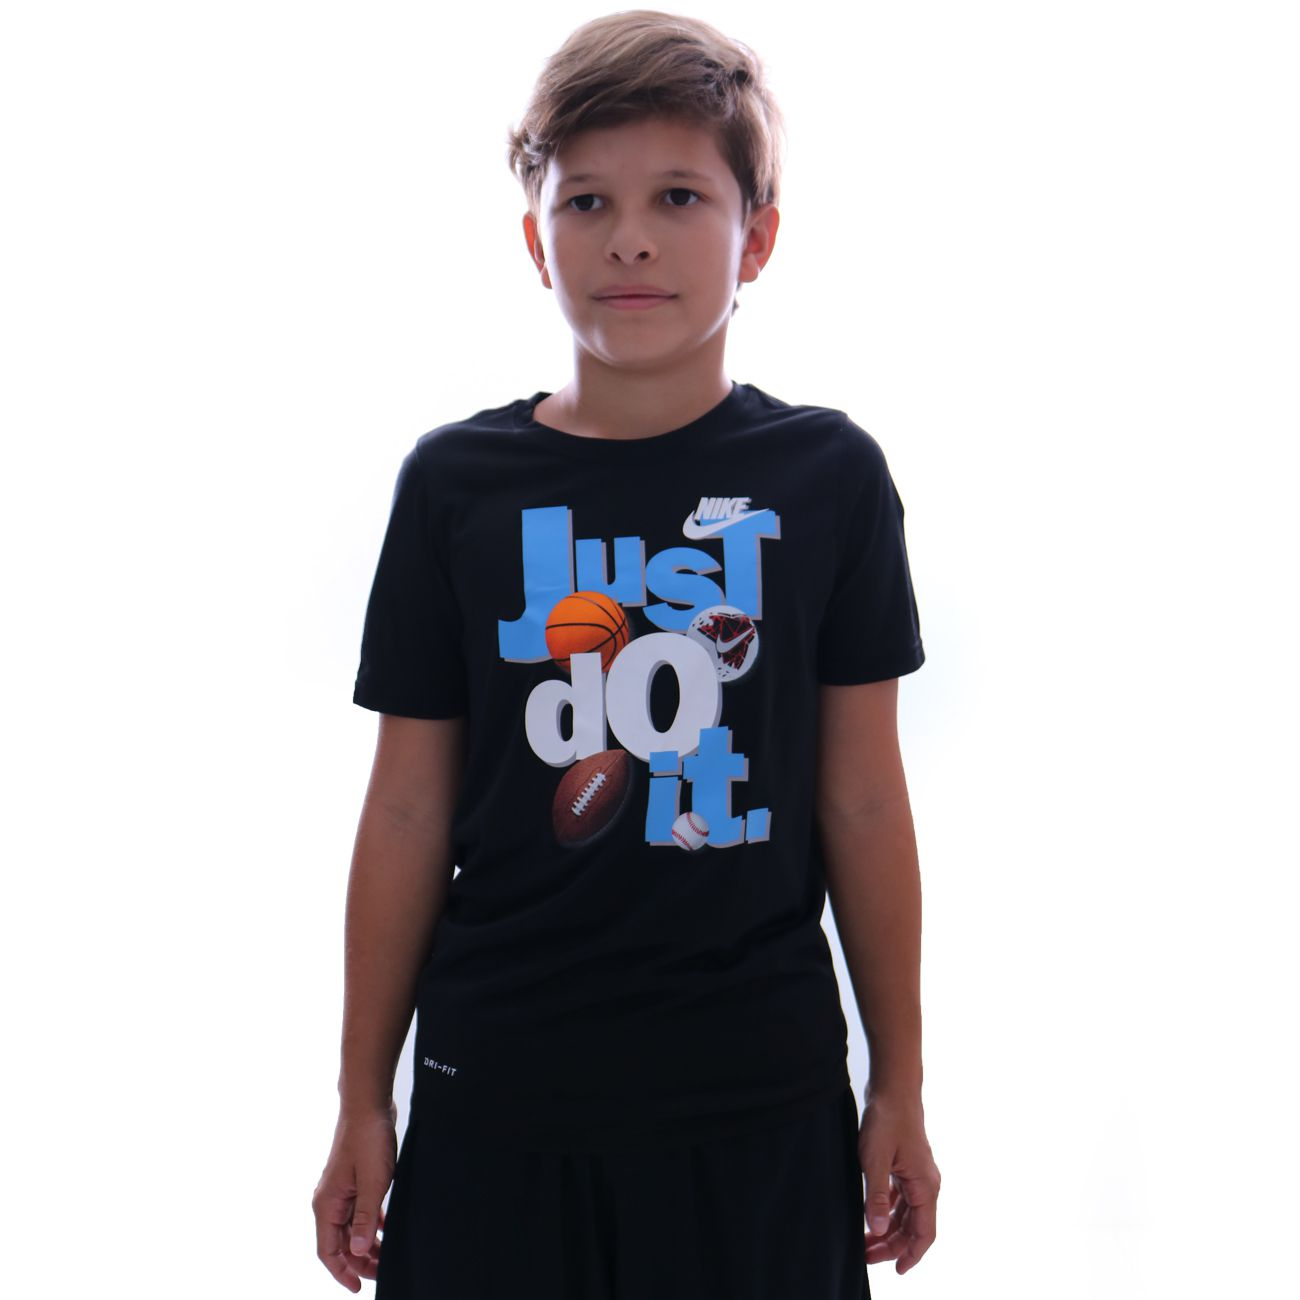 Camiseta Nike Just Do It Infantil